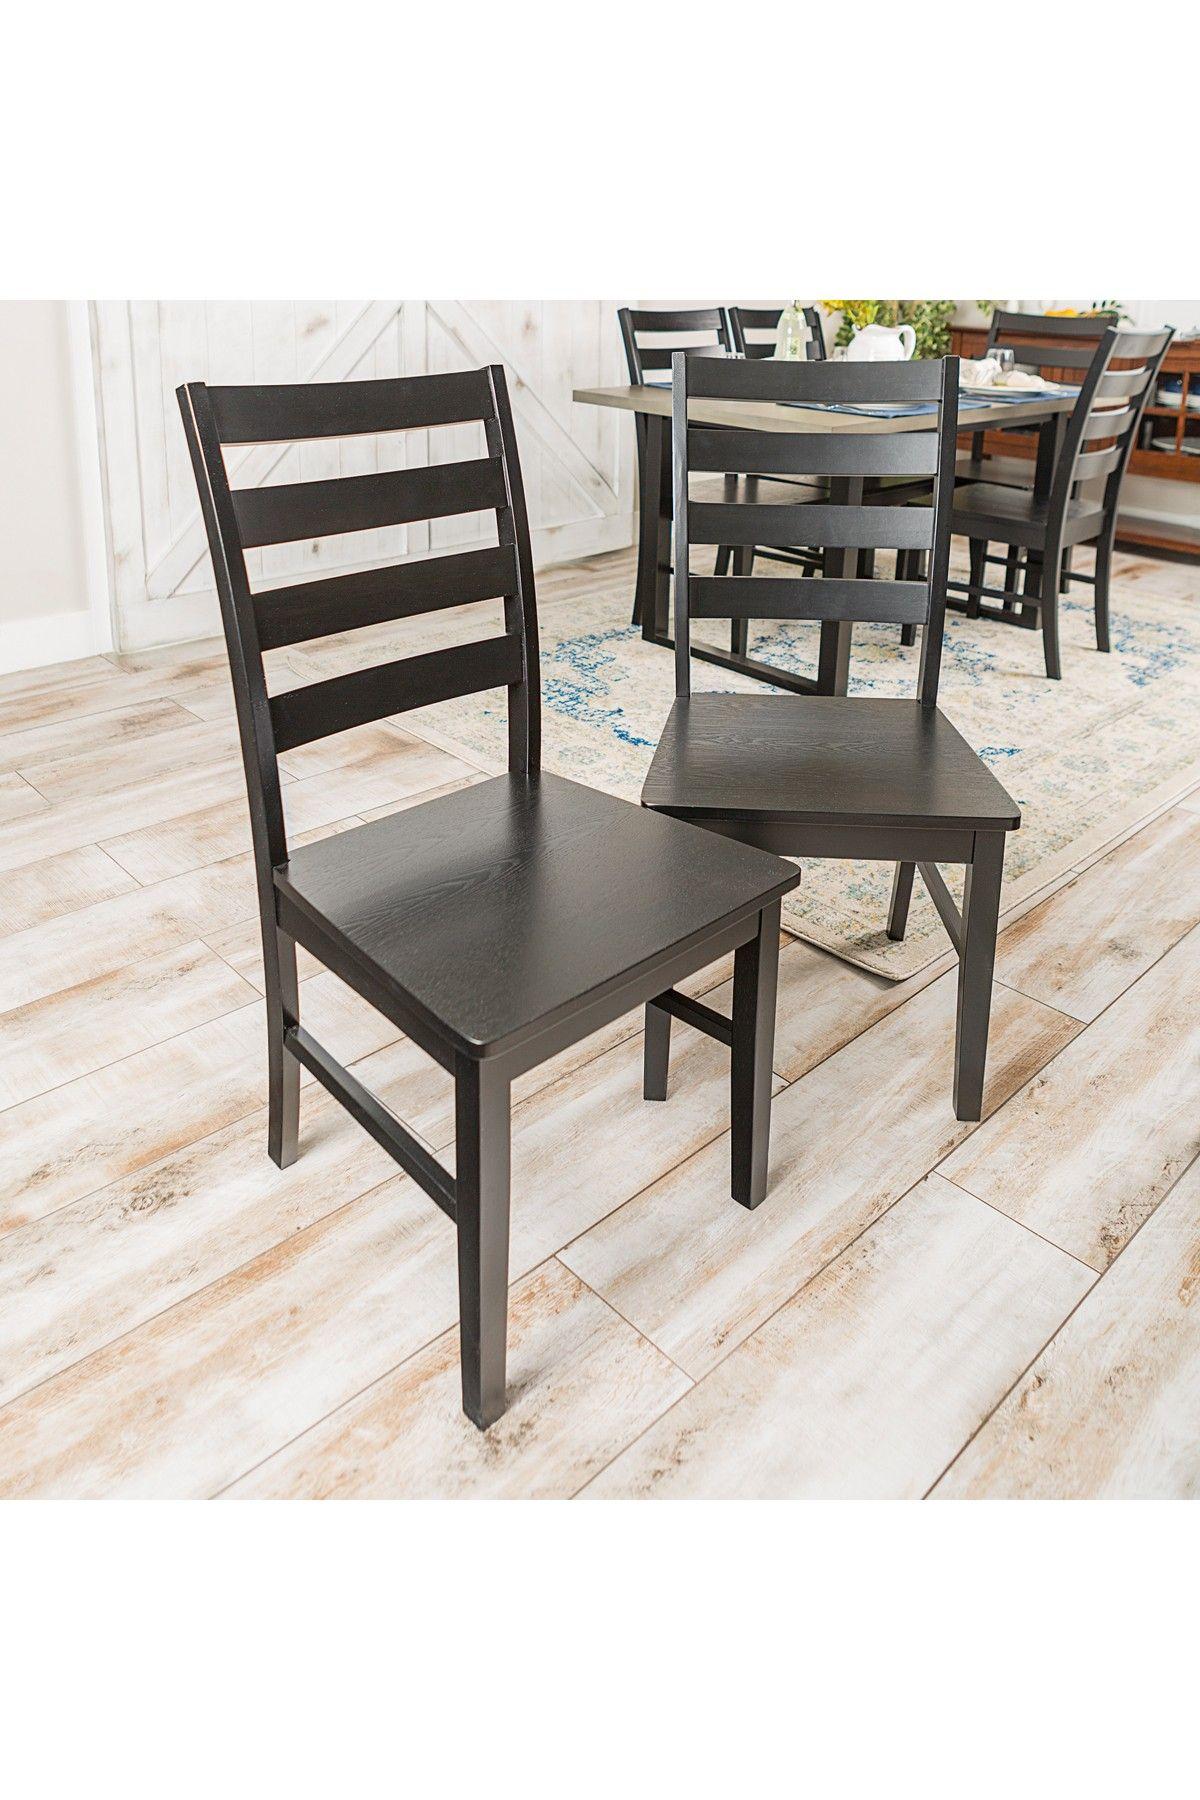 Walker Edison Furniture pany Wood Ladder Back Black Dining Chair